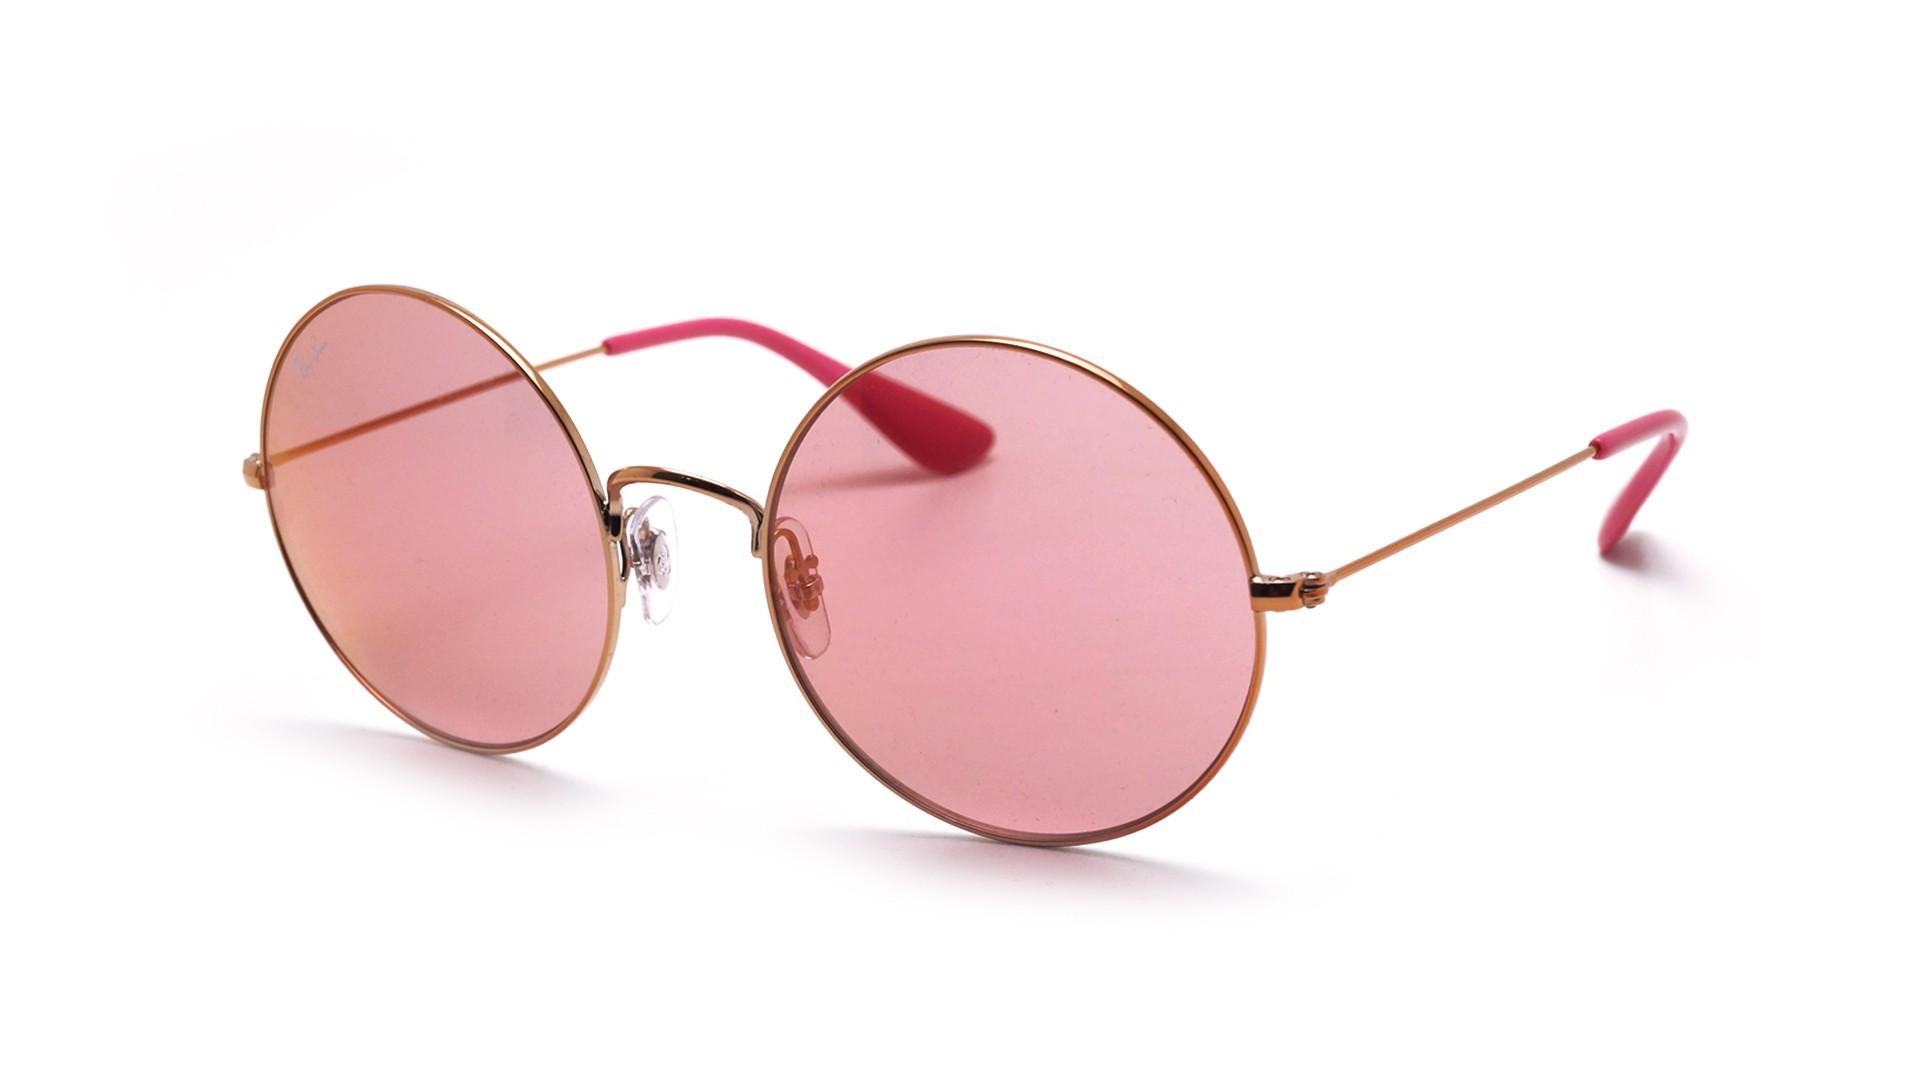 fd4b7d2a31 Sunglasses Ray-Ban Ja-jo Copper RB3592 9035F6 55-20 Large